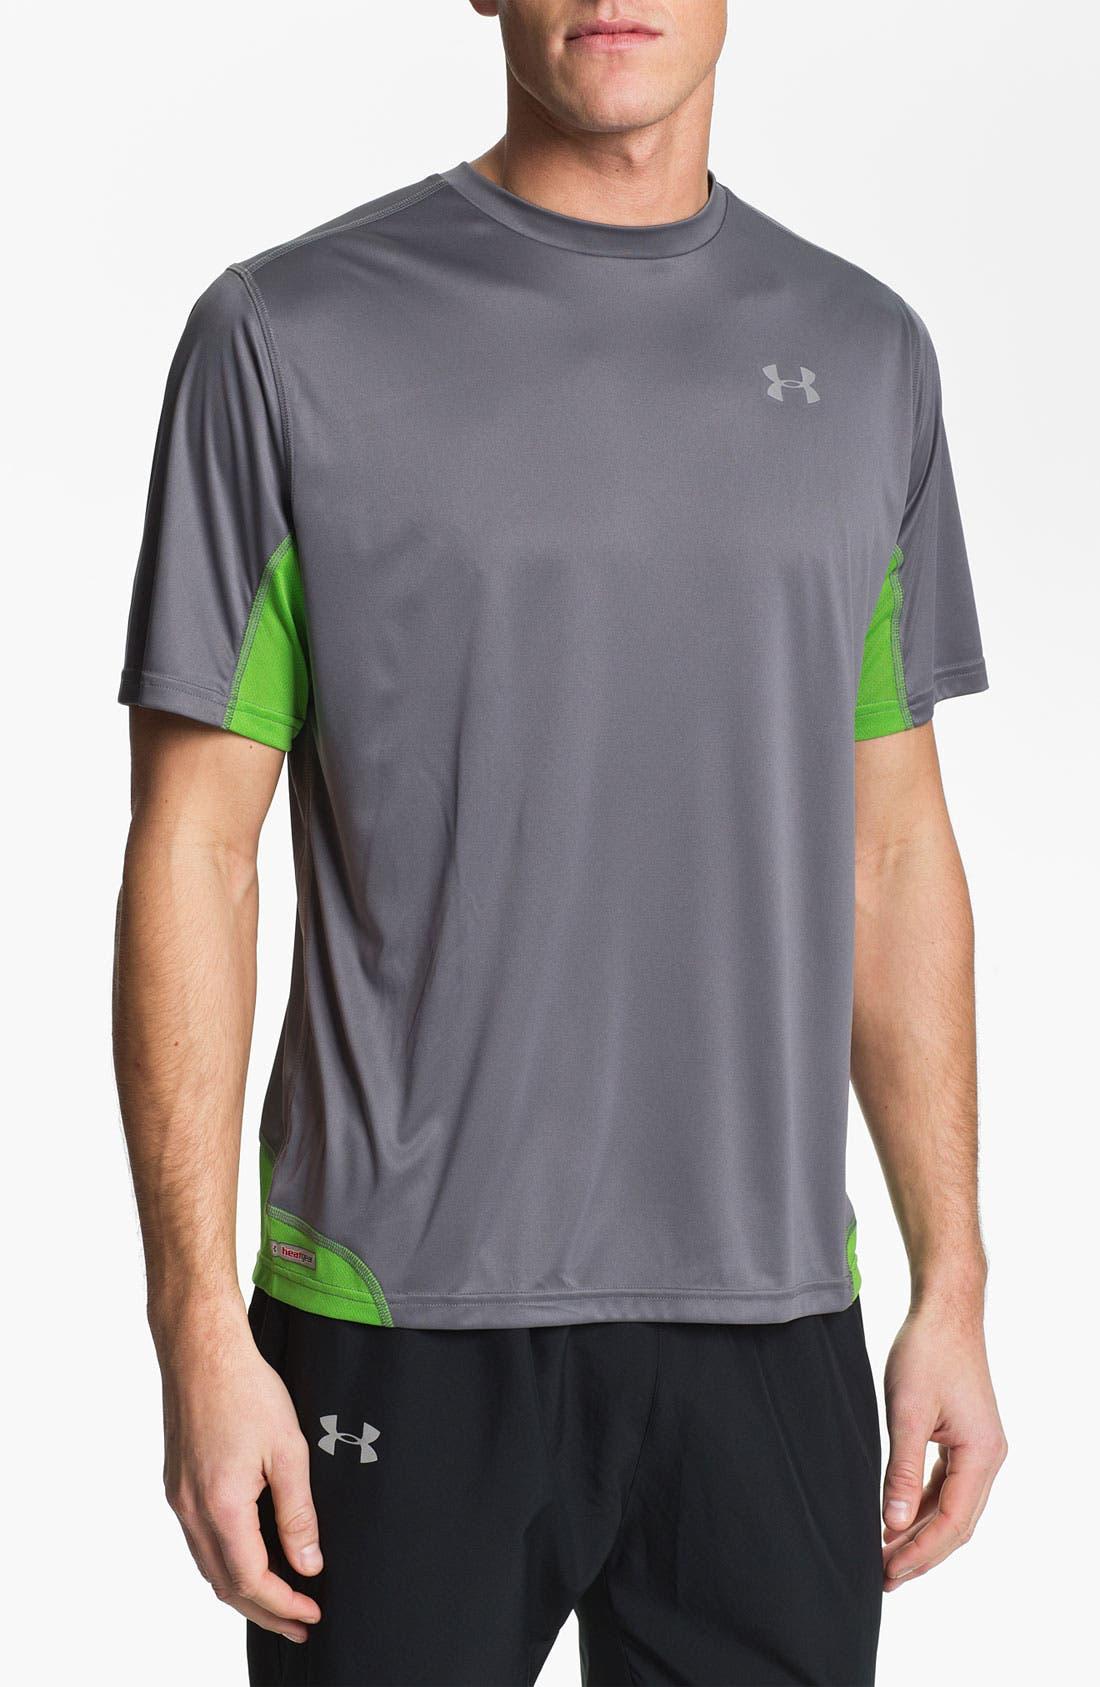 Alternate Image 1 Selected - Under Armour 'Run' HeatGear® Flyweight T-Shirt